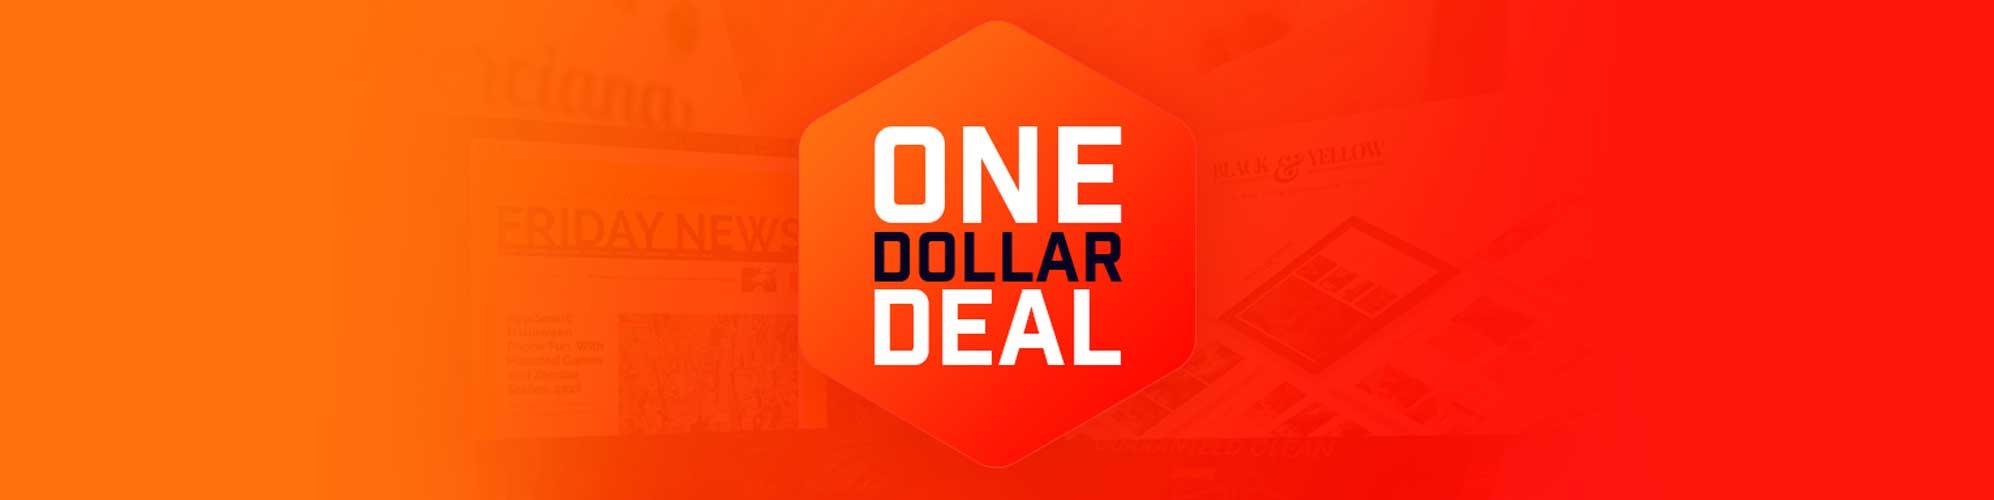 One Dollar Deal